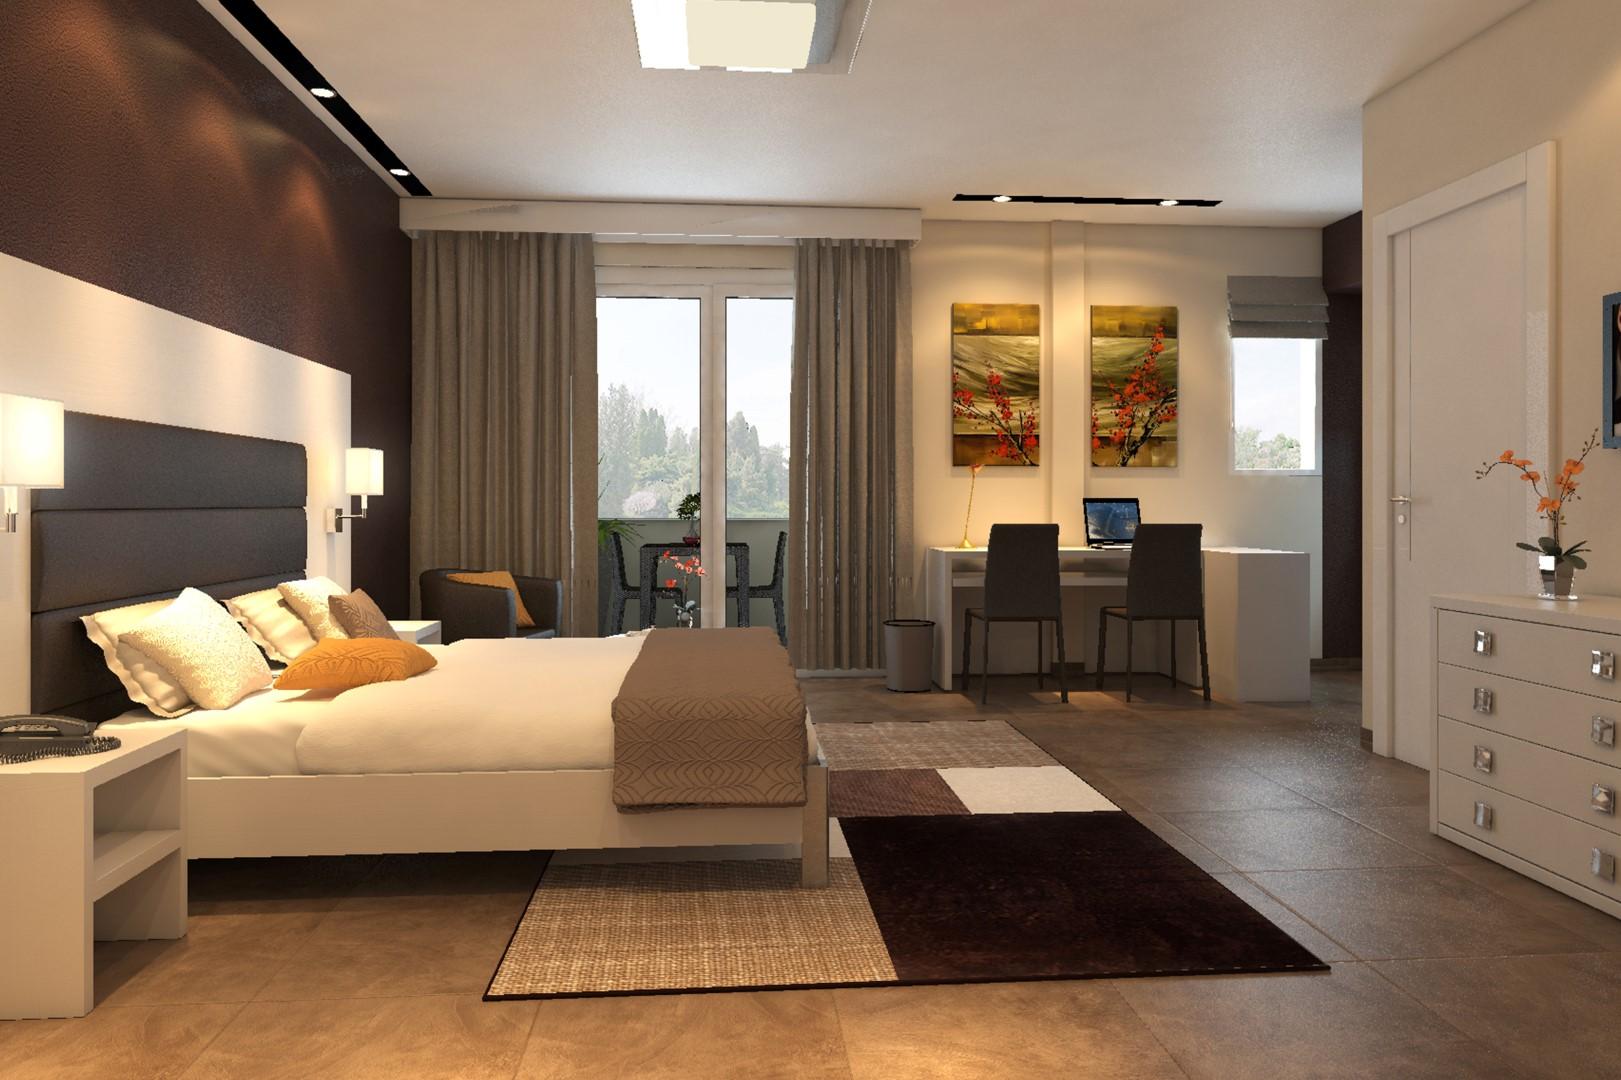 furniture_0001_2.double room_hotel furniture (8)